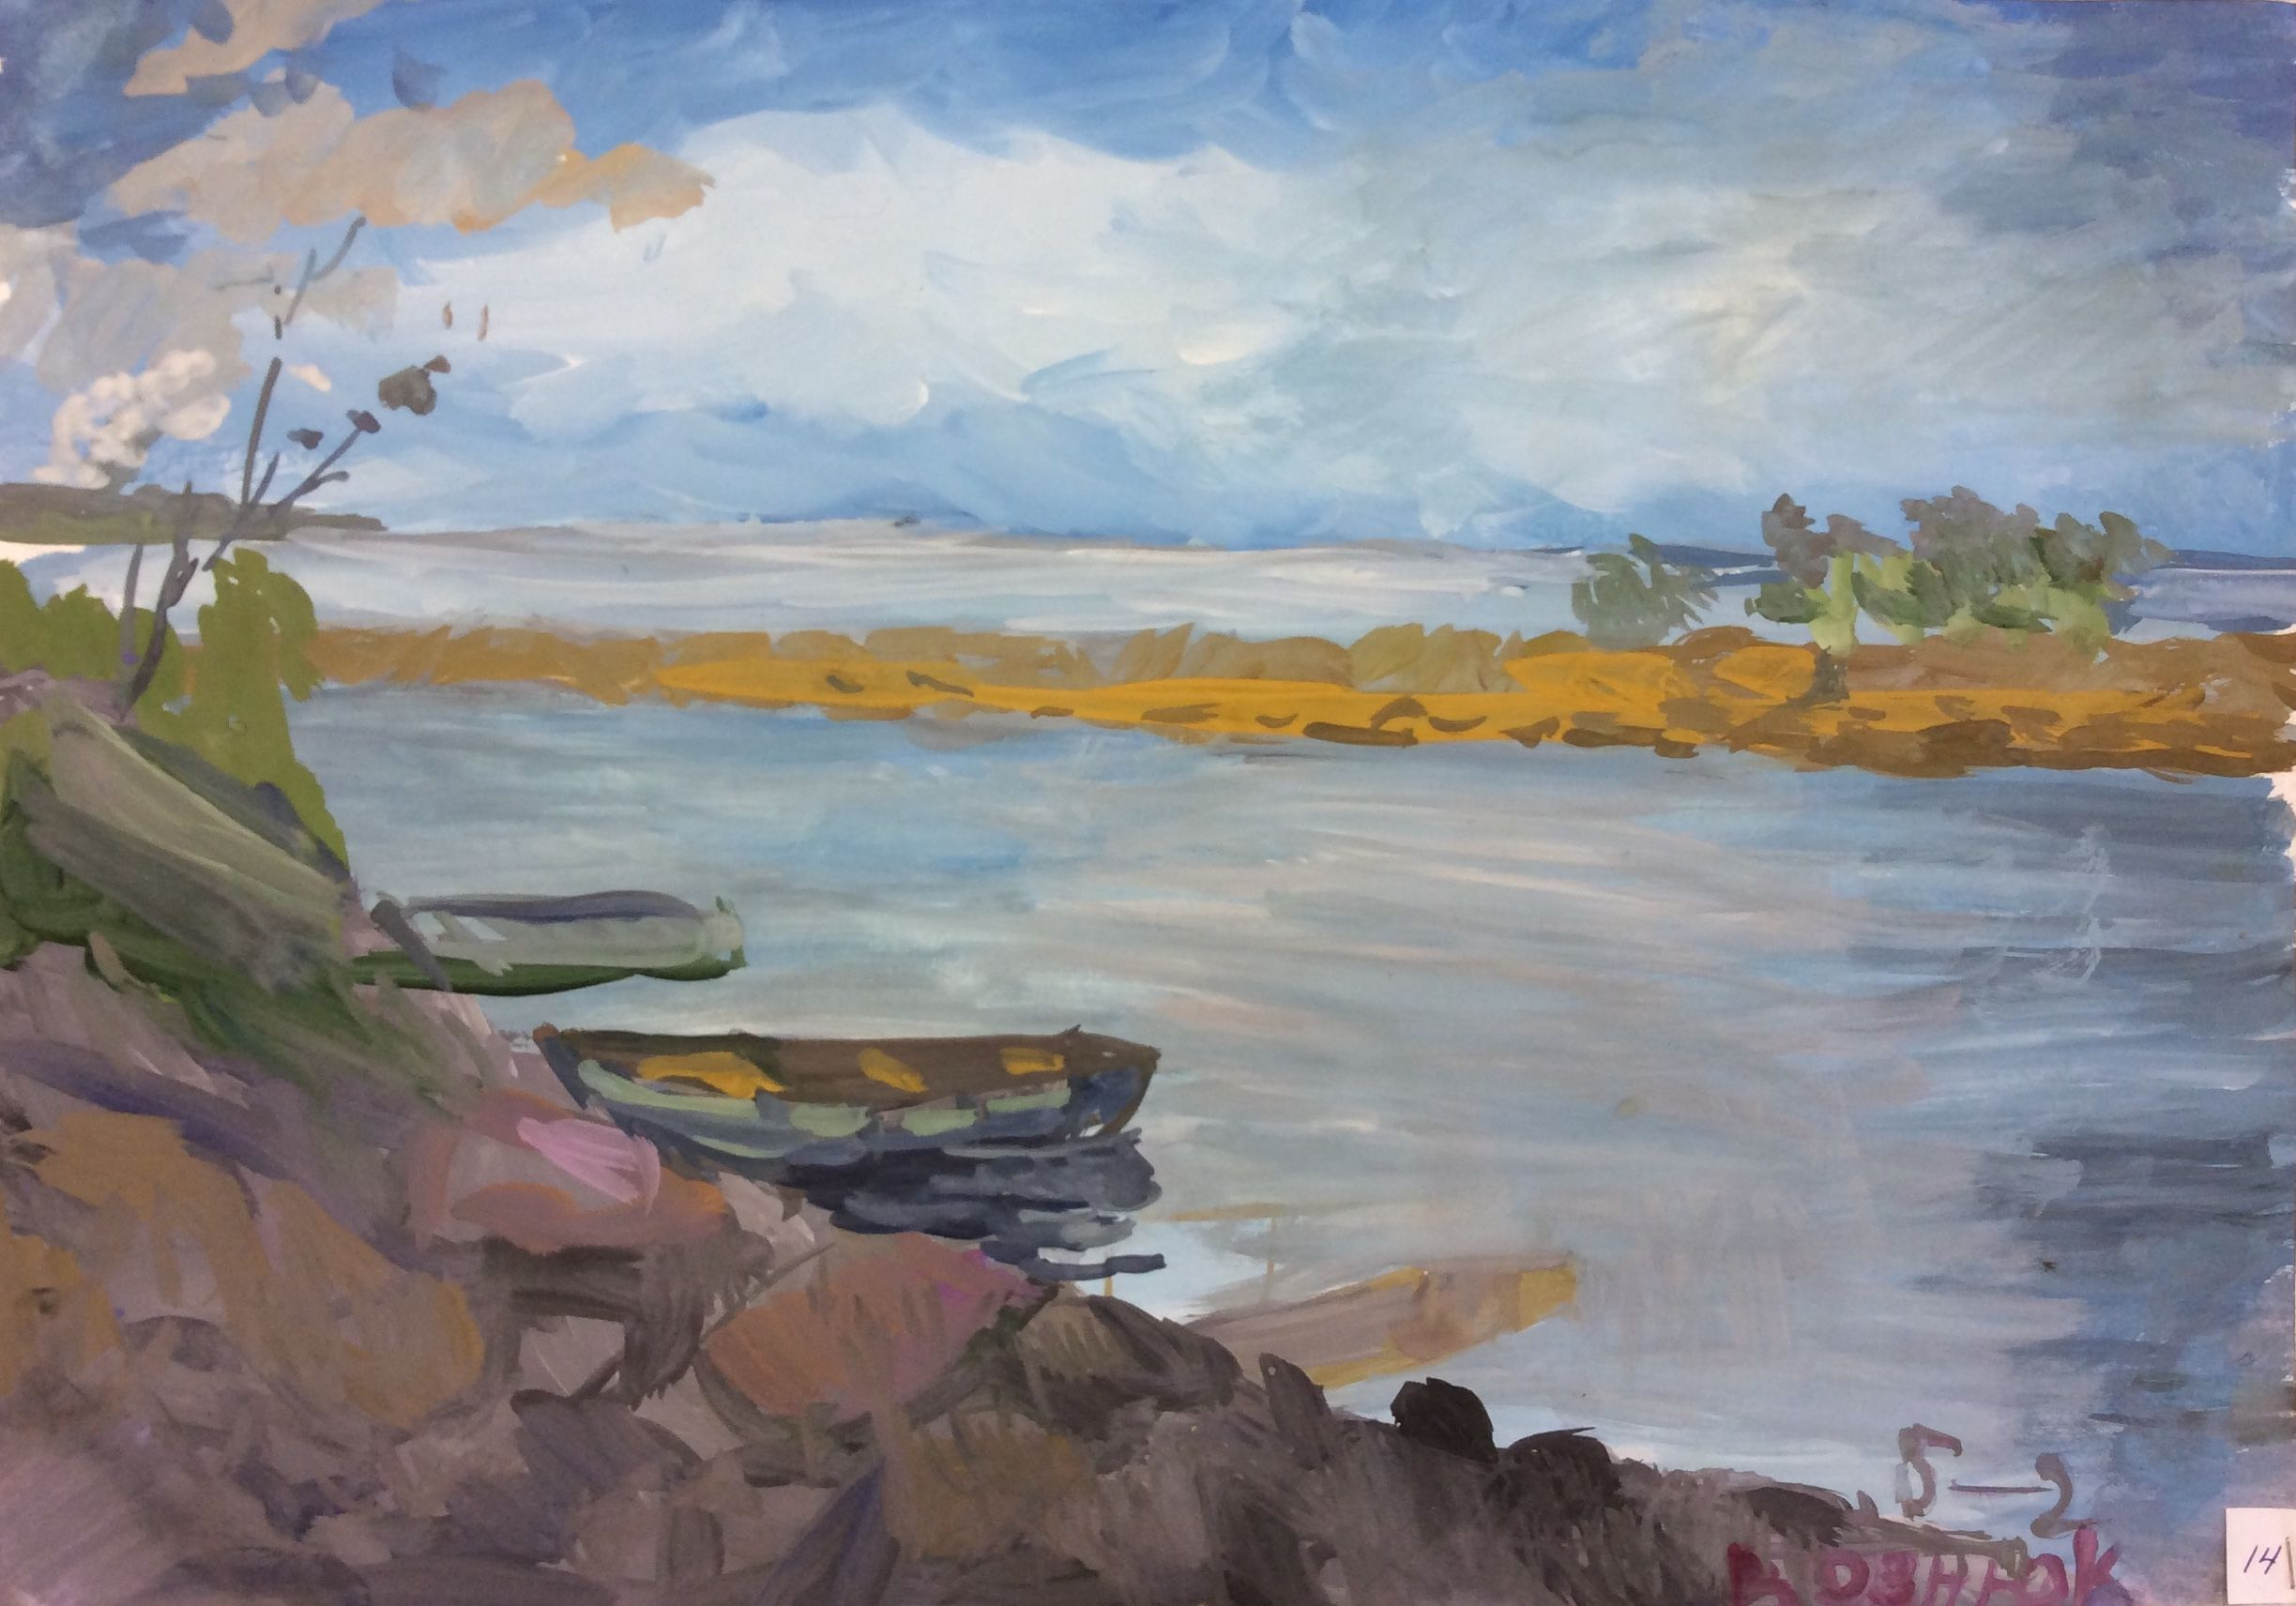 «Лодки на канале», Вознюк Александра (13 лет), гуашь, преп. В. А. Саржин